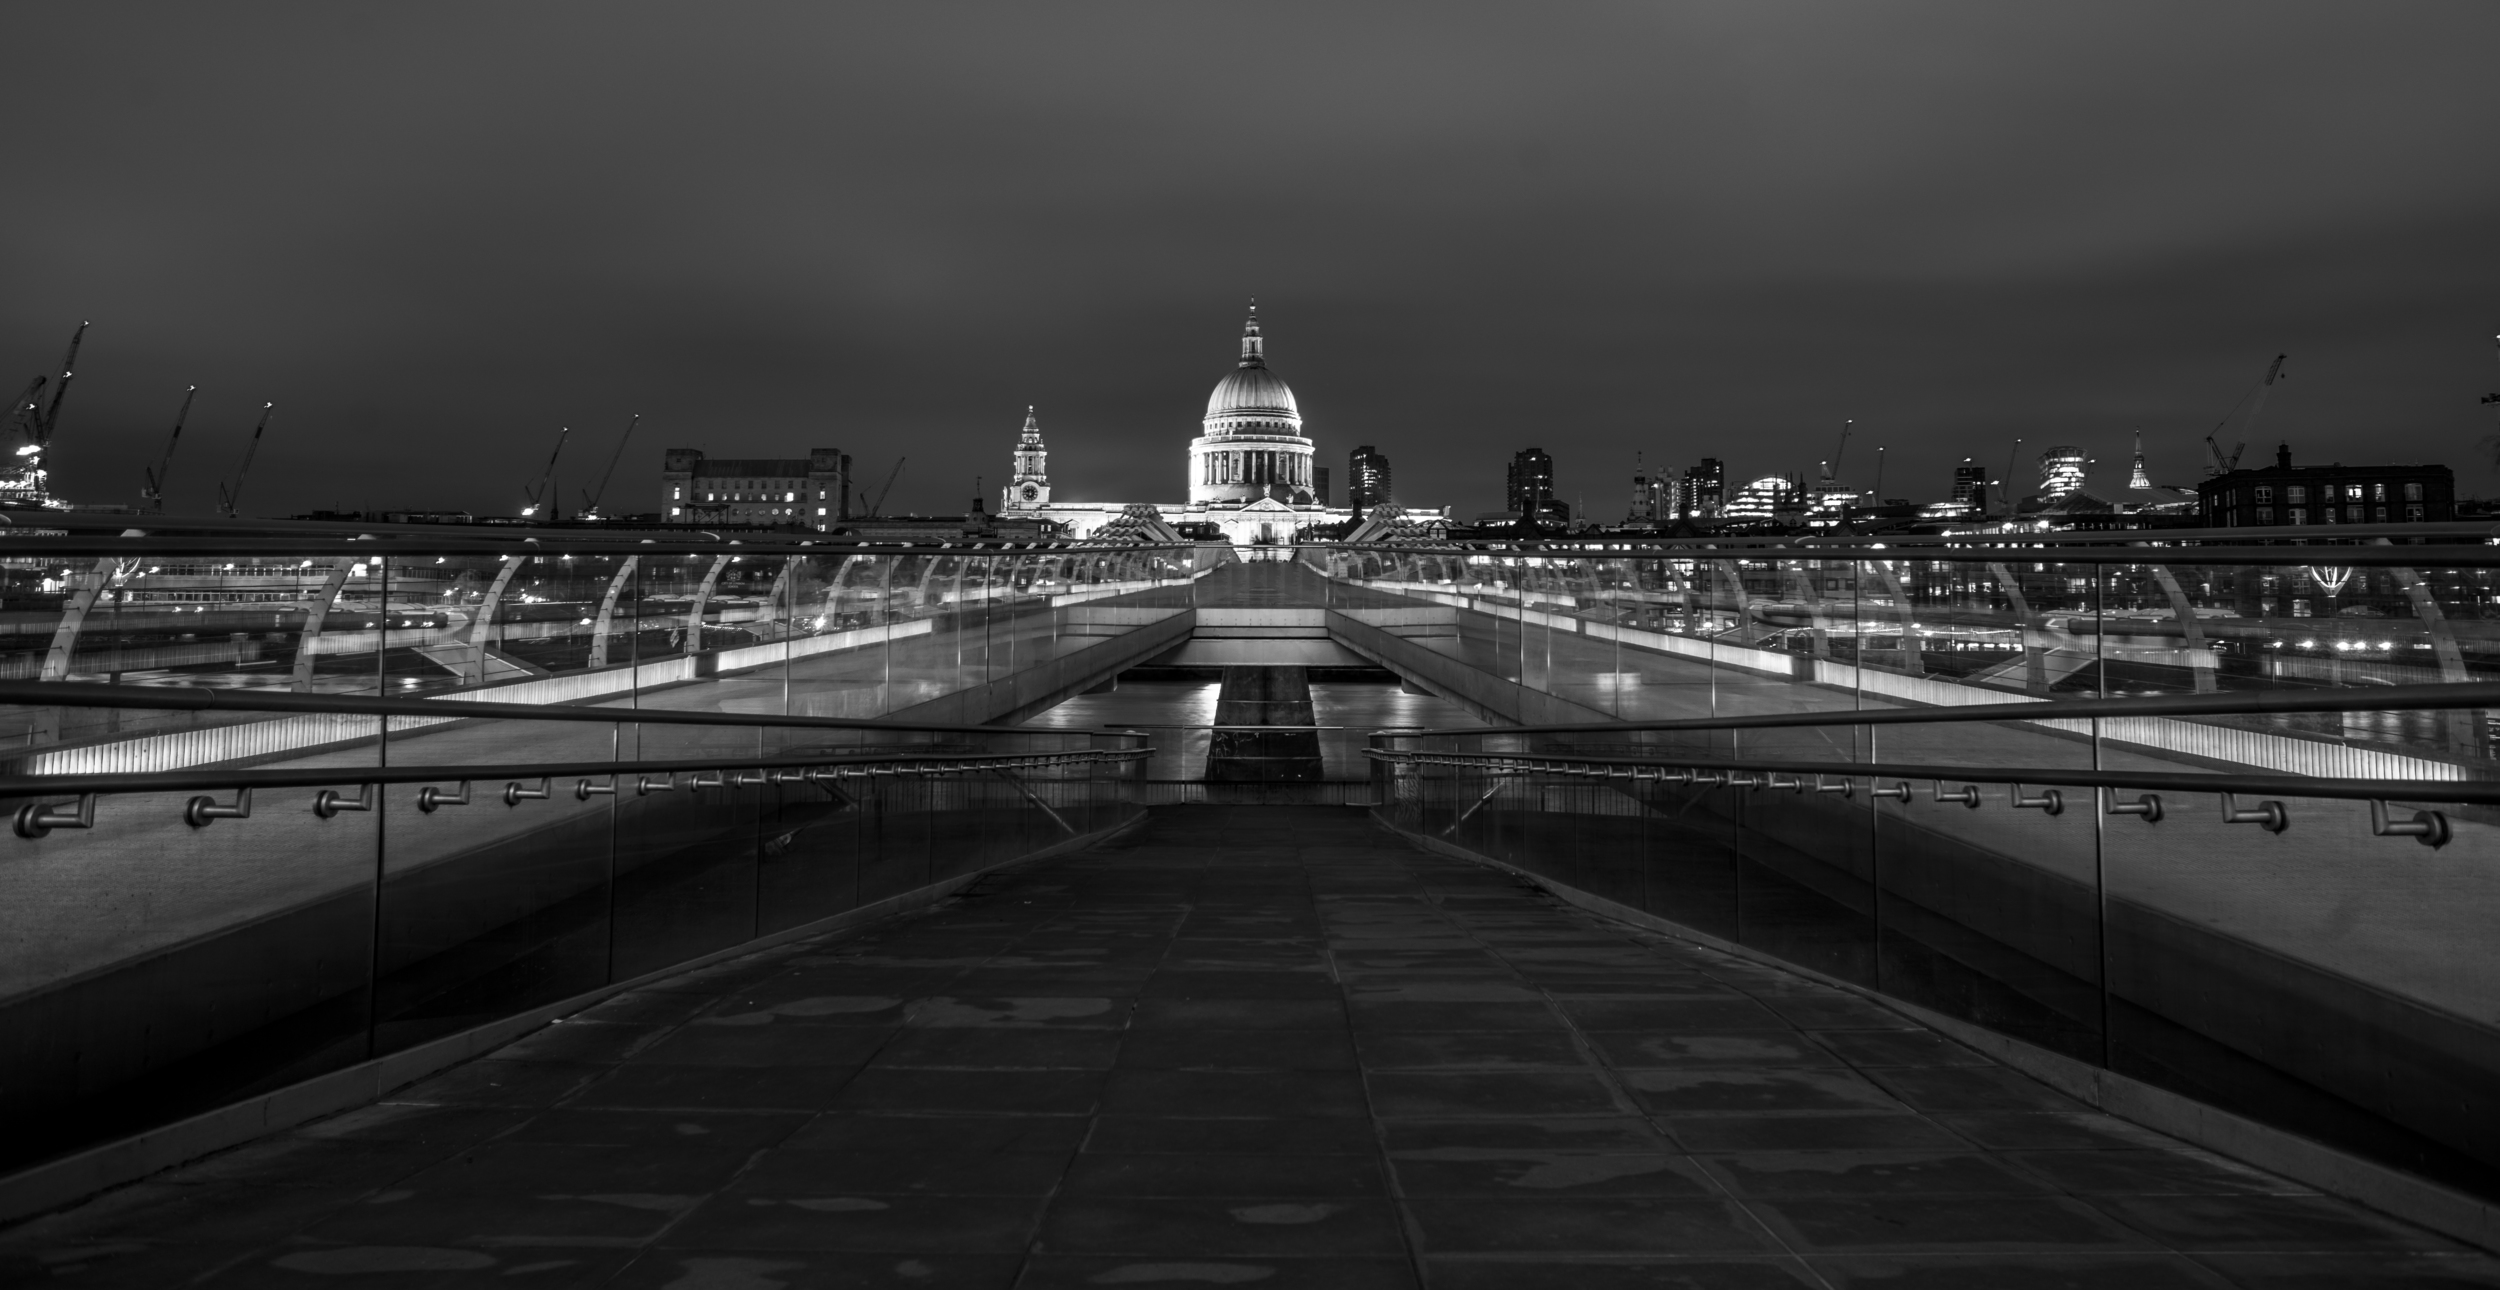 Millennium Bridge, London - England